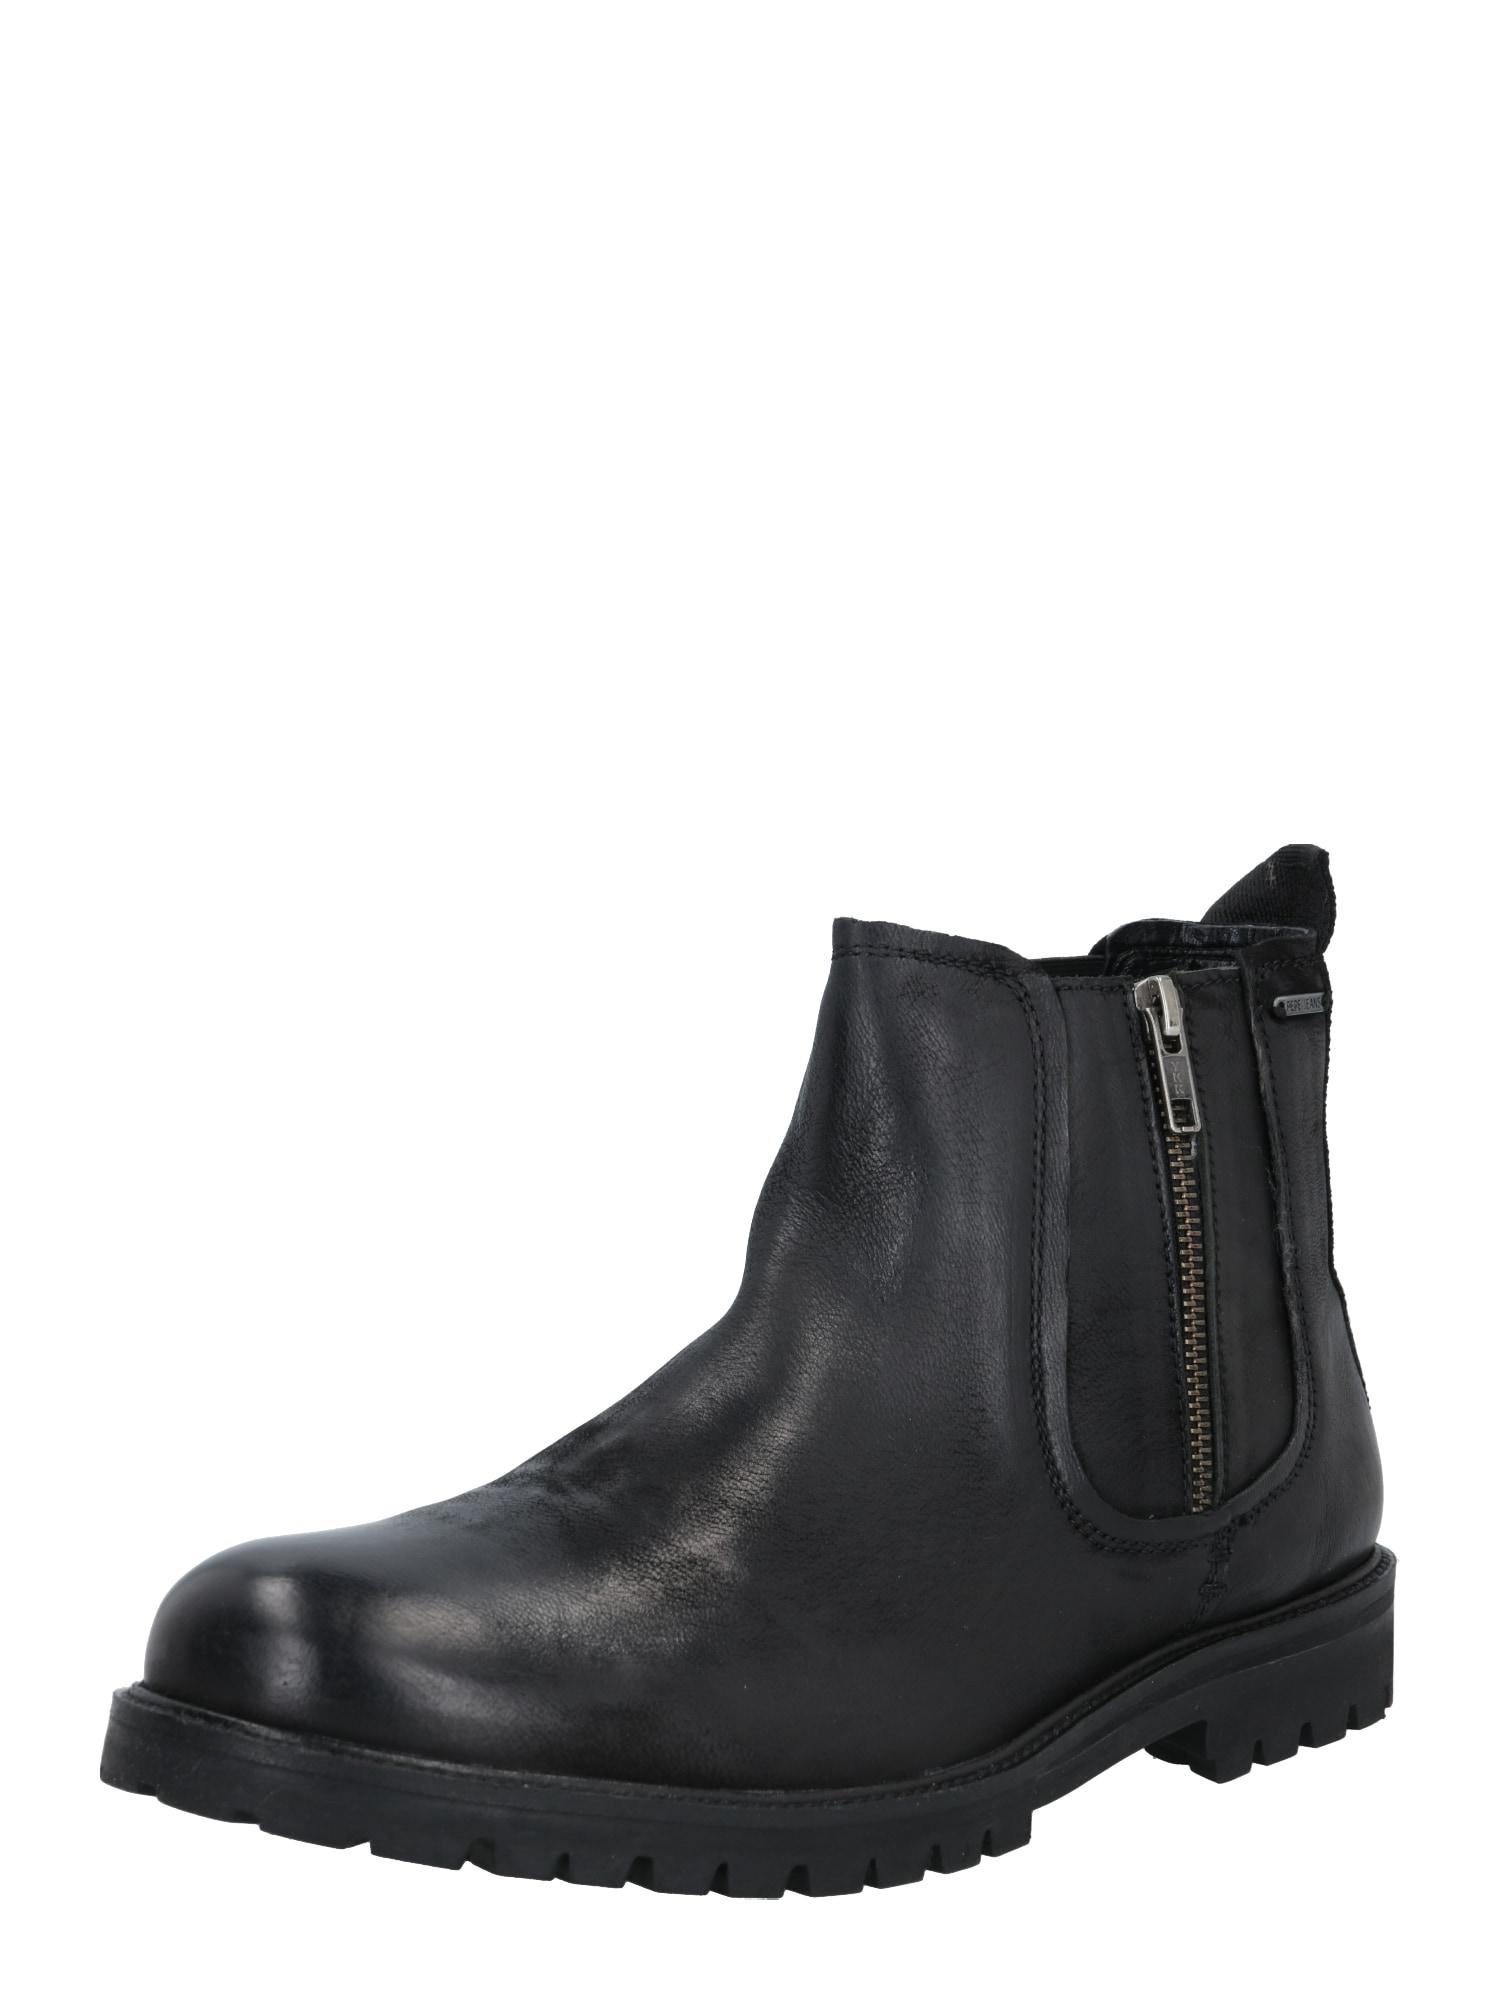 "Pepe Jeans ""Chelsea"" batai juoda"